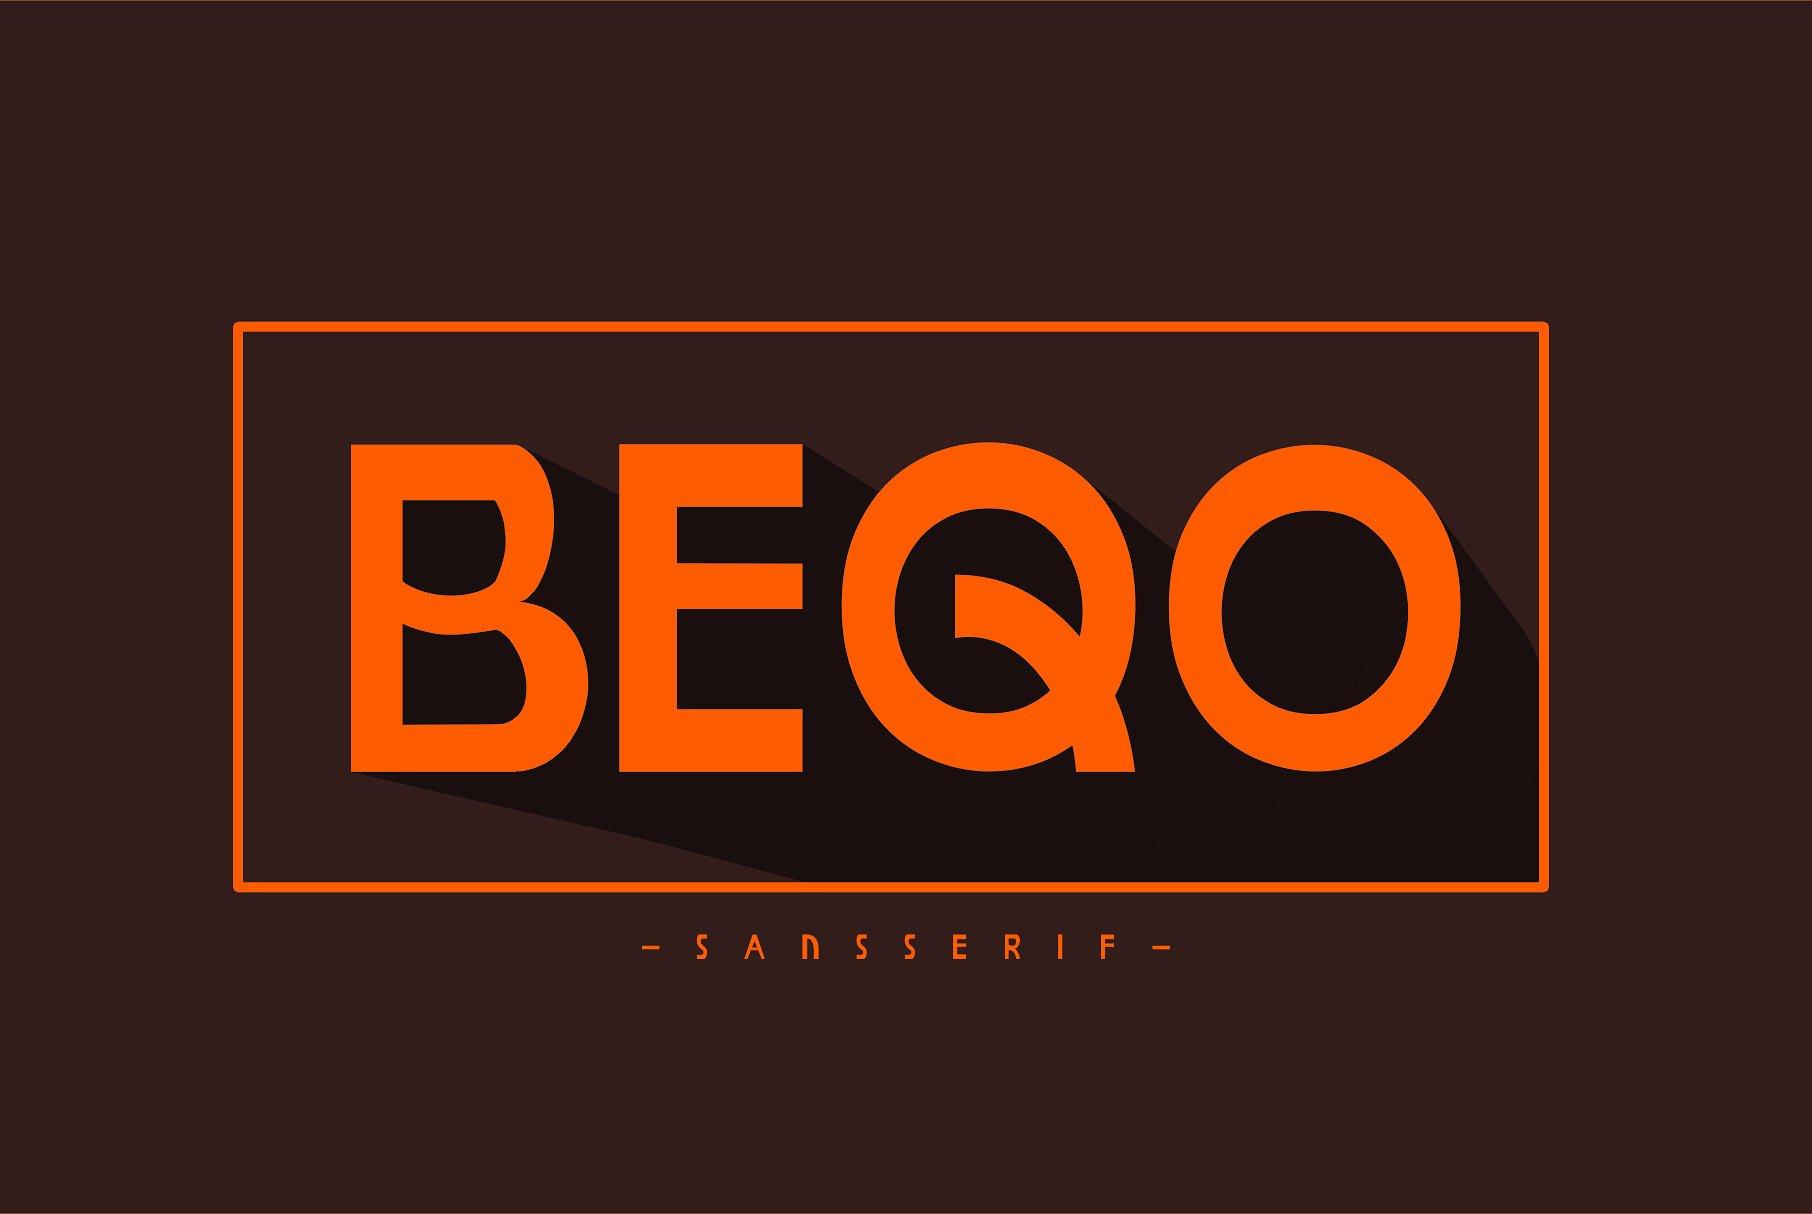 Beqo Sans Serif